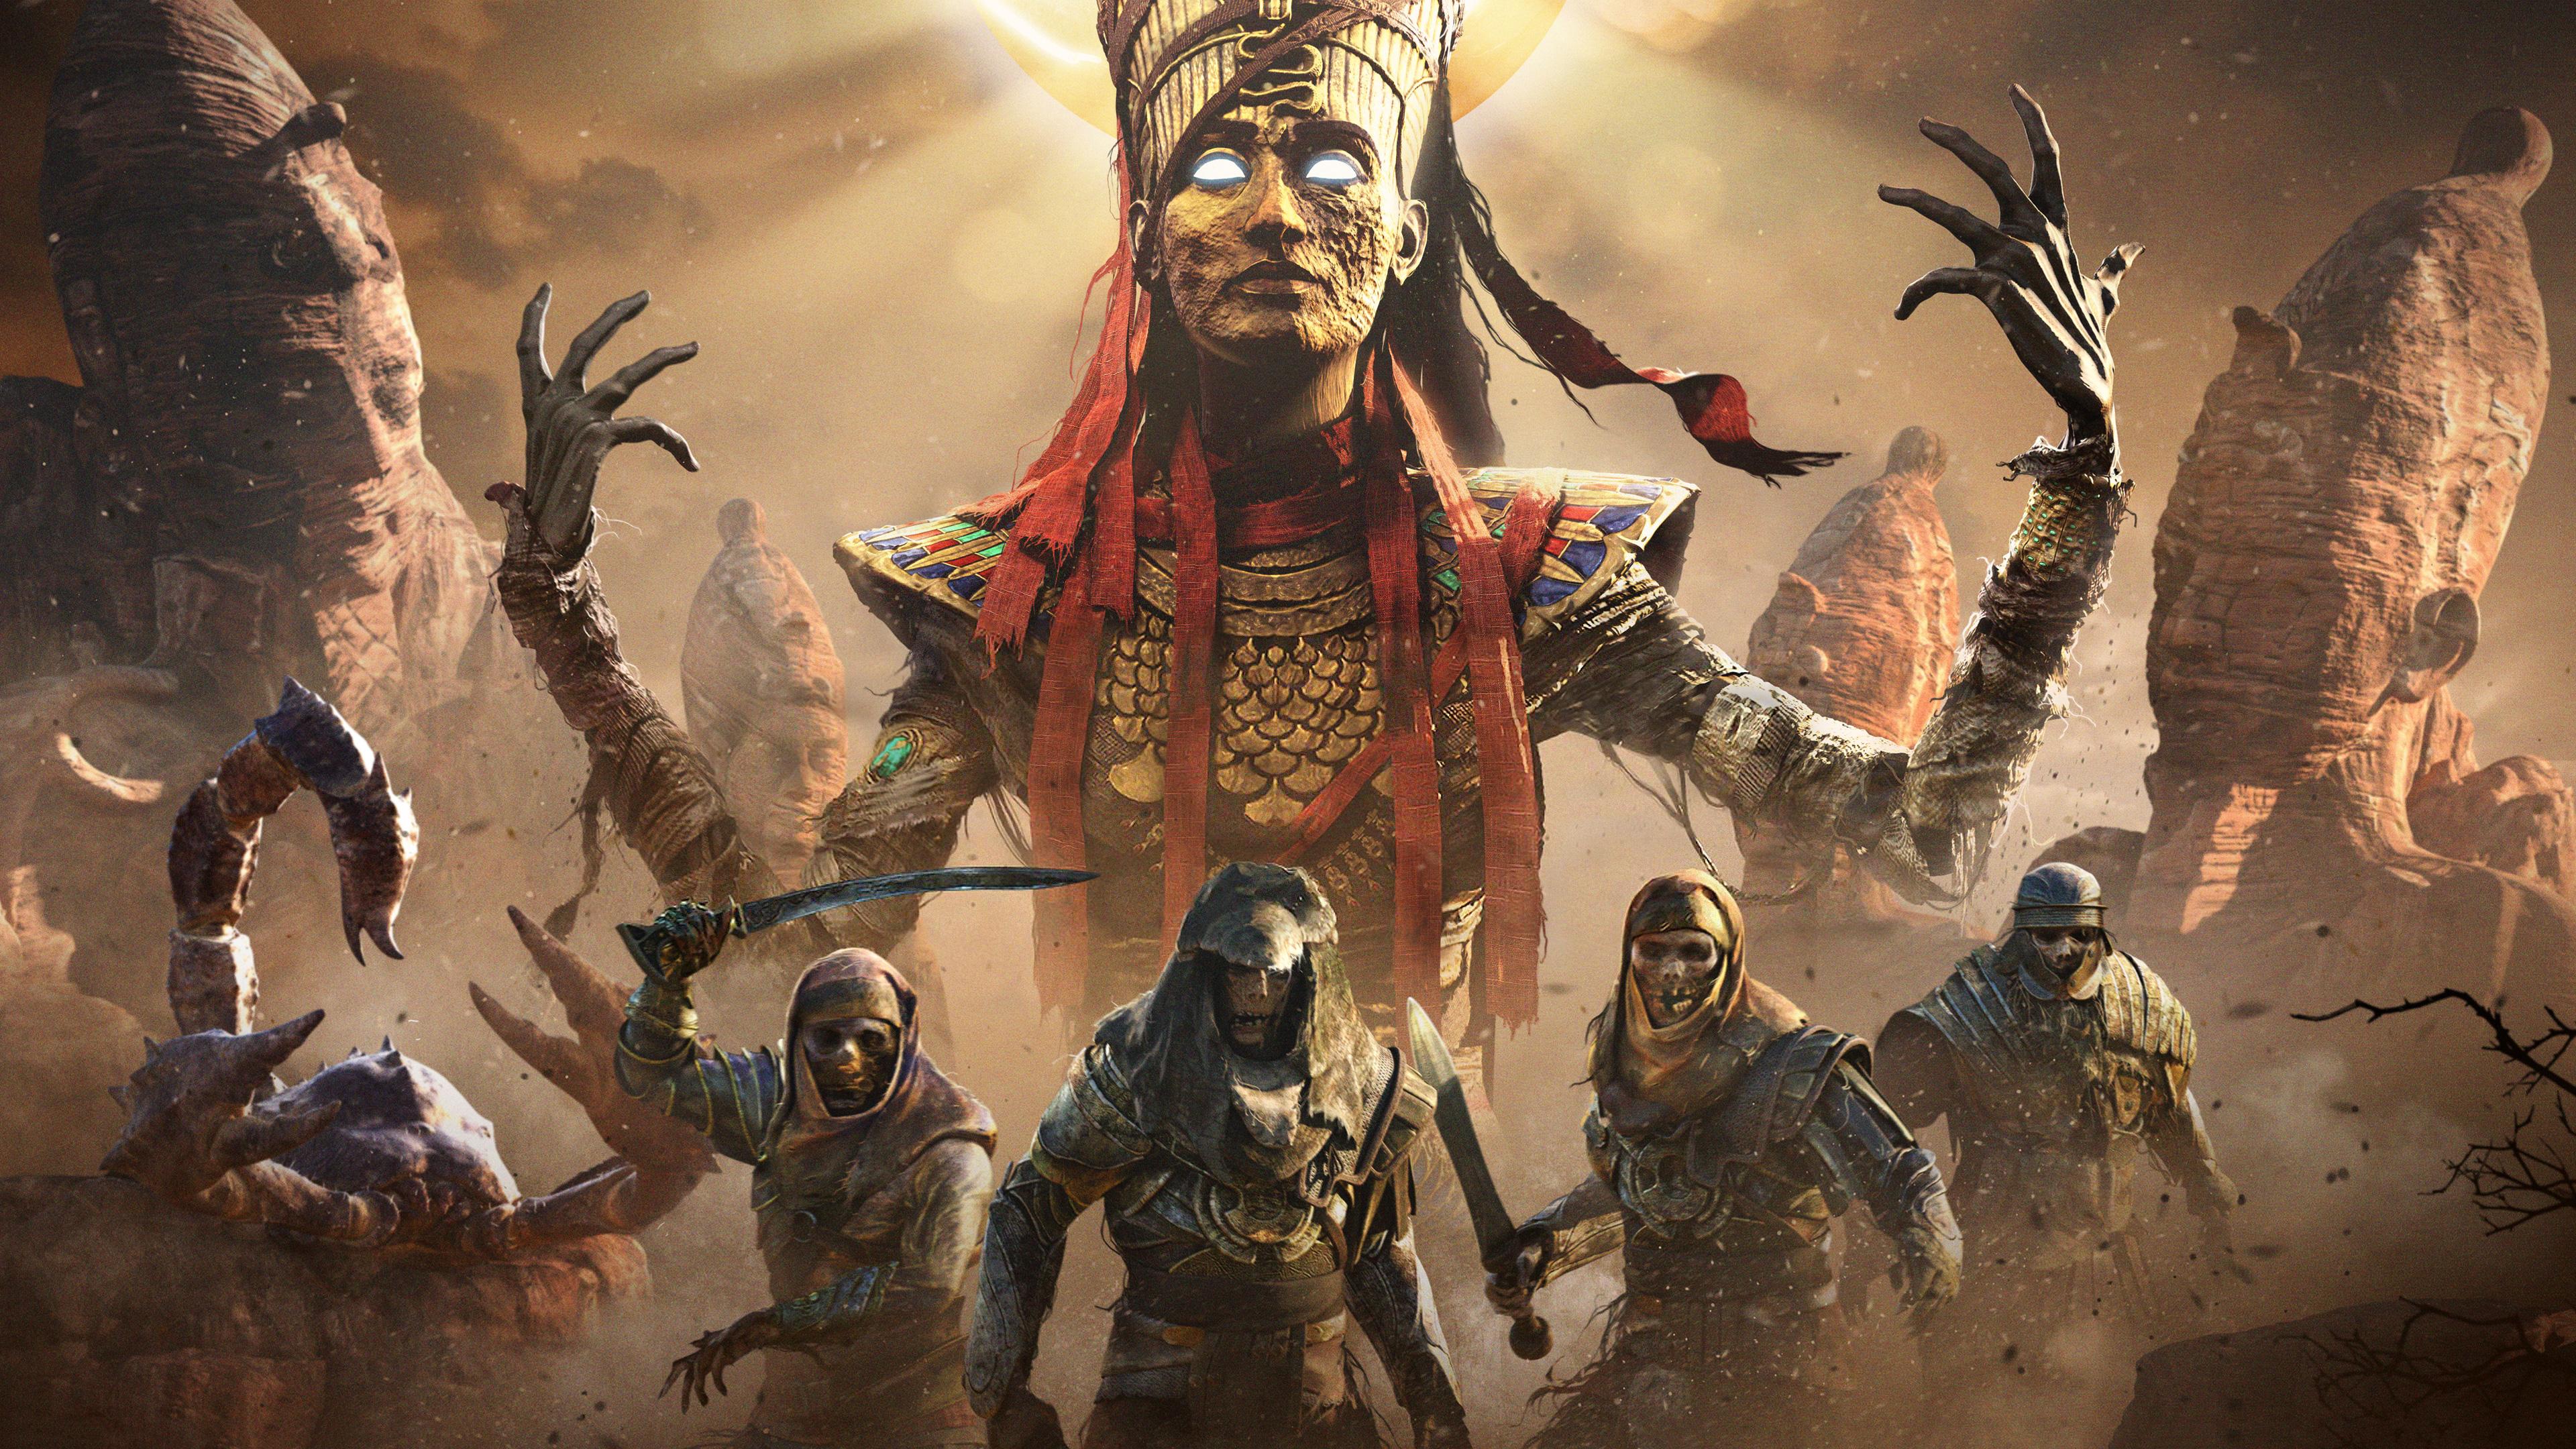 4k Assassins Creed Origins 2018 Hd Games 4k Wallpapers